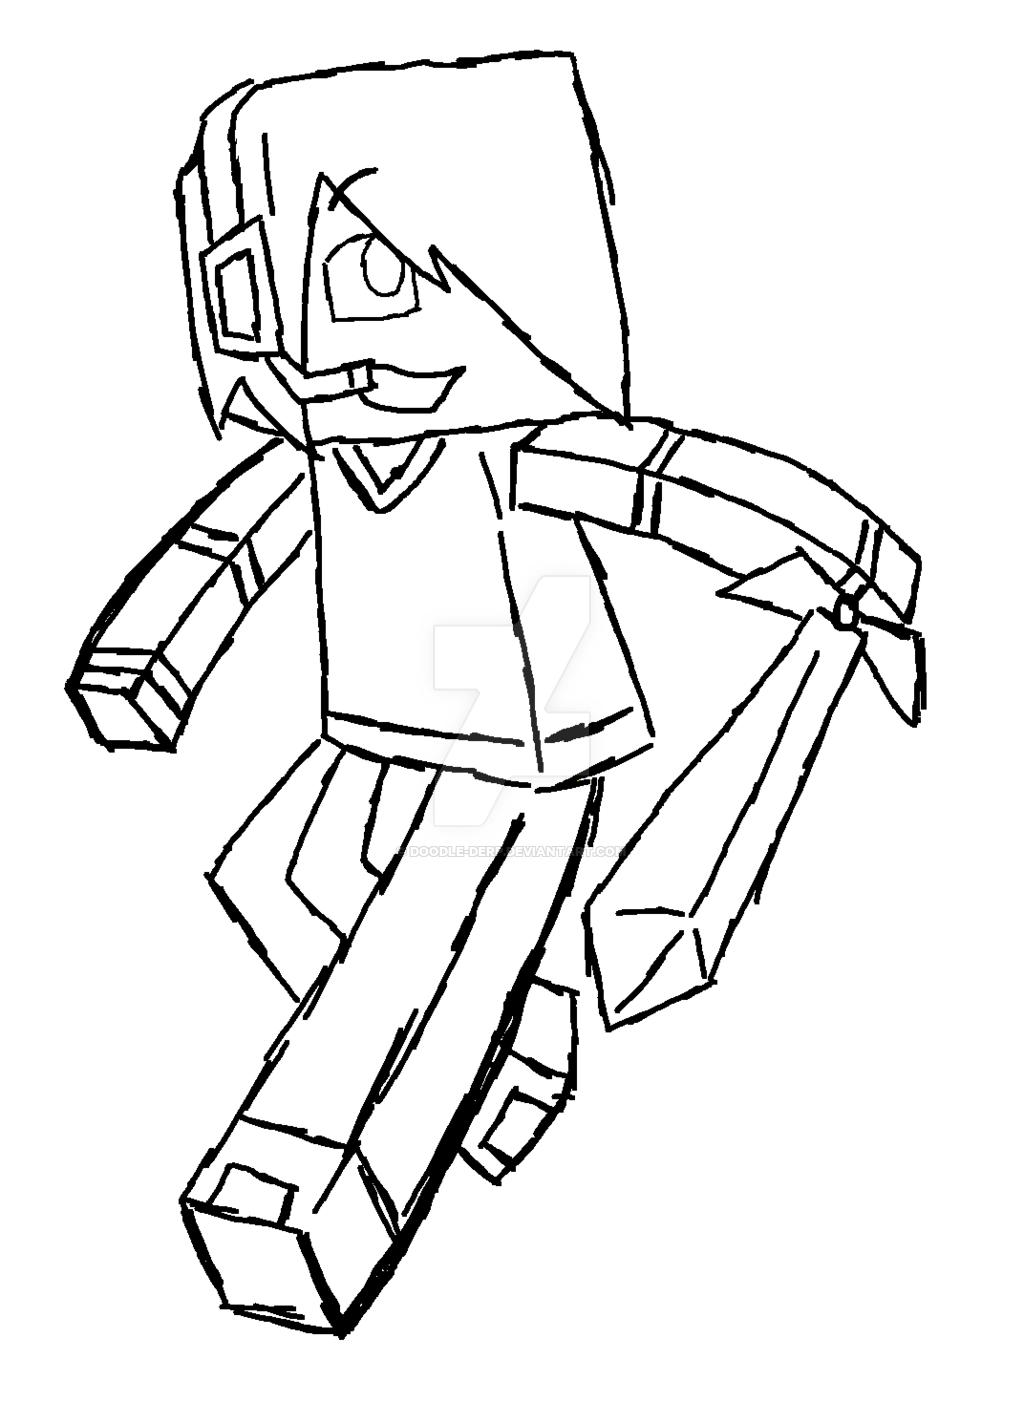 Ausmalbilder Minecraft Skin : Minecraft Character Drawing Template Choice Image Template Design